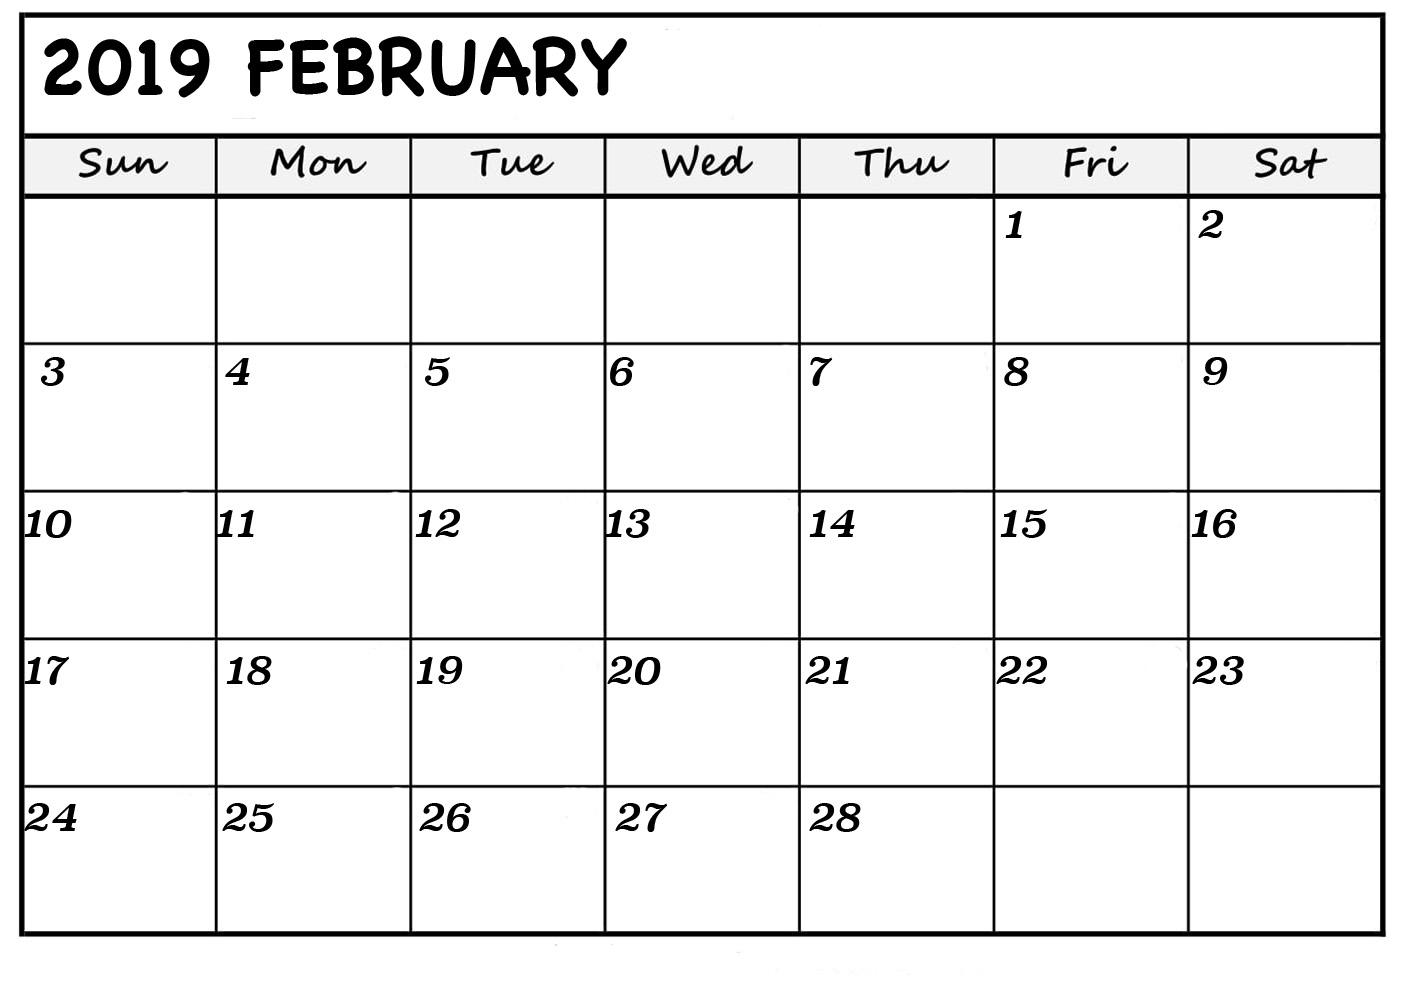 Feb 2019 Calendar Printable